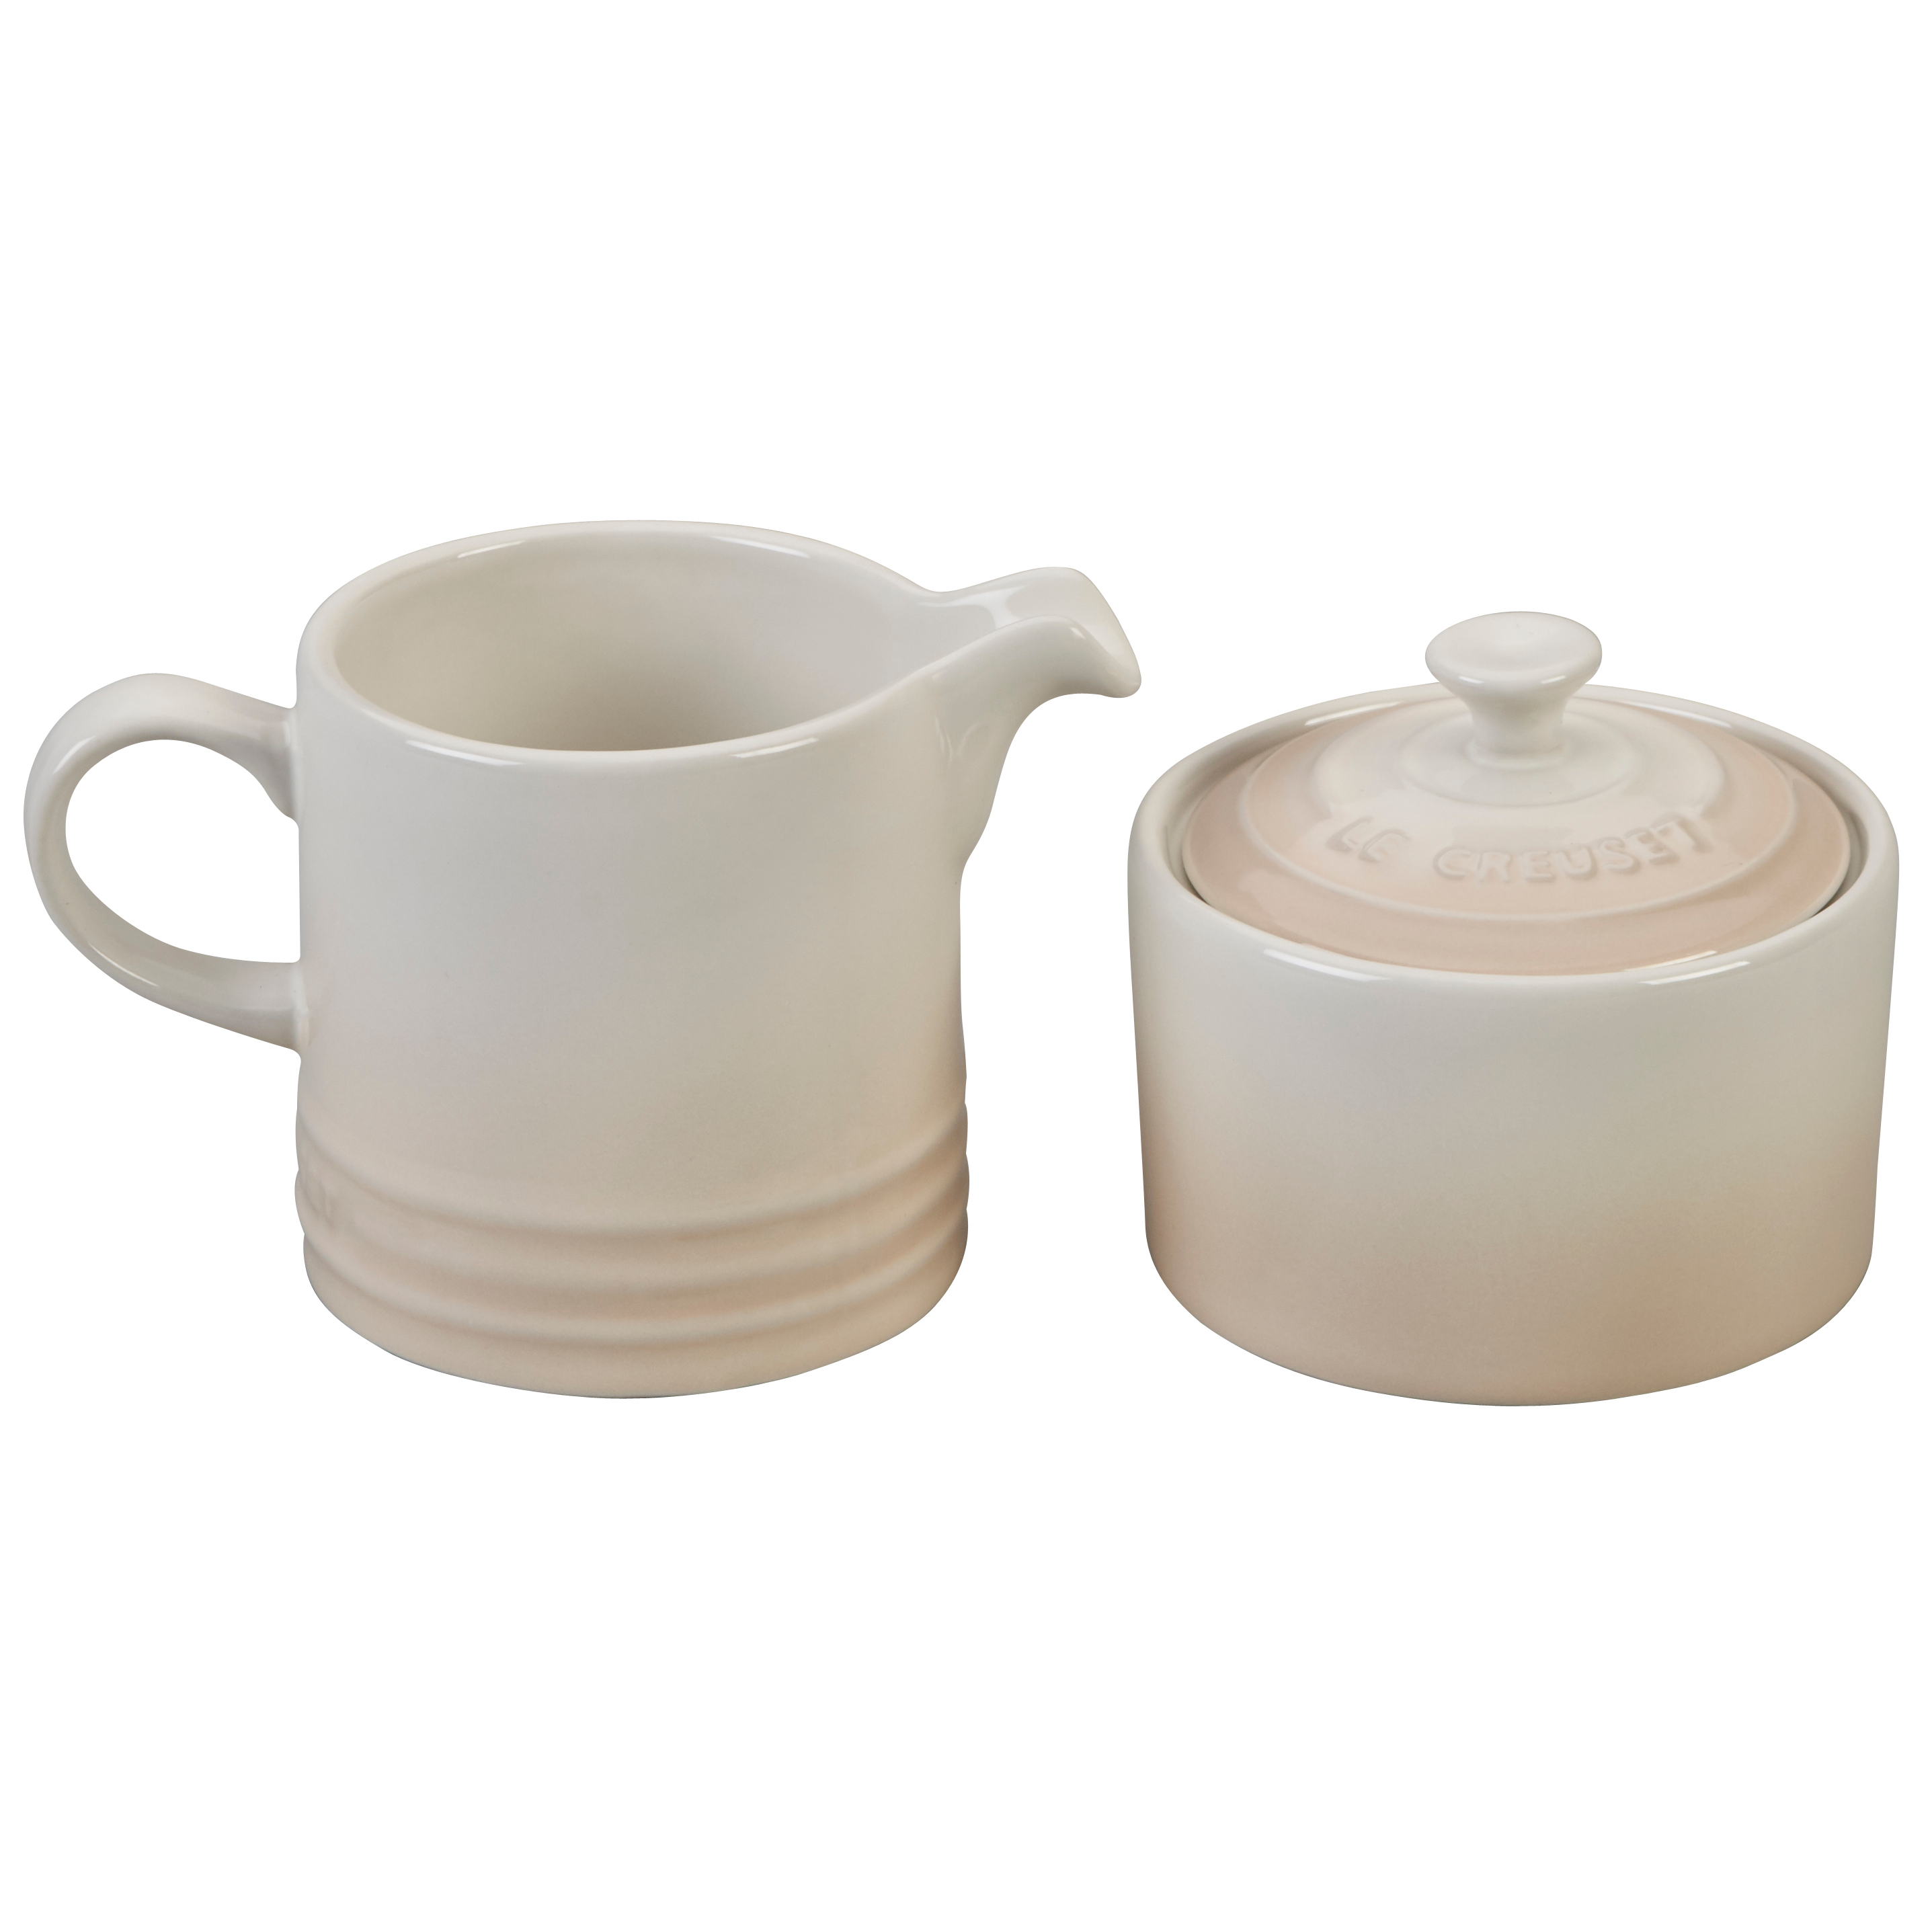 Le Creuset Meringue Stoneware Cream and Sugar Set